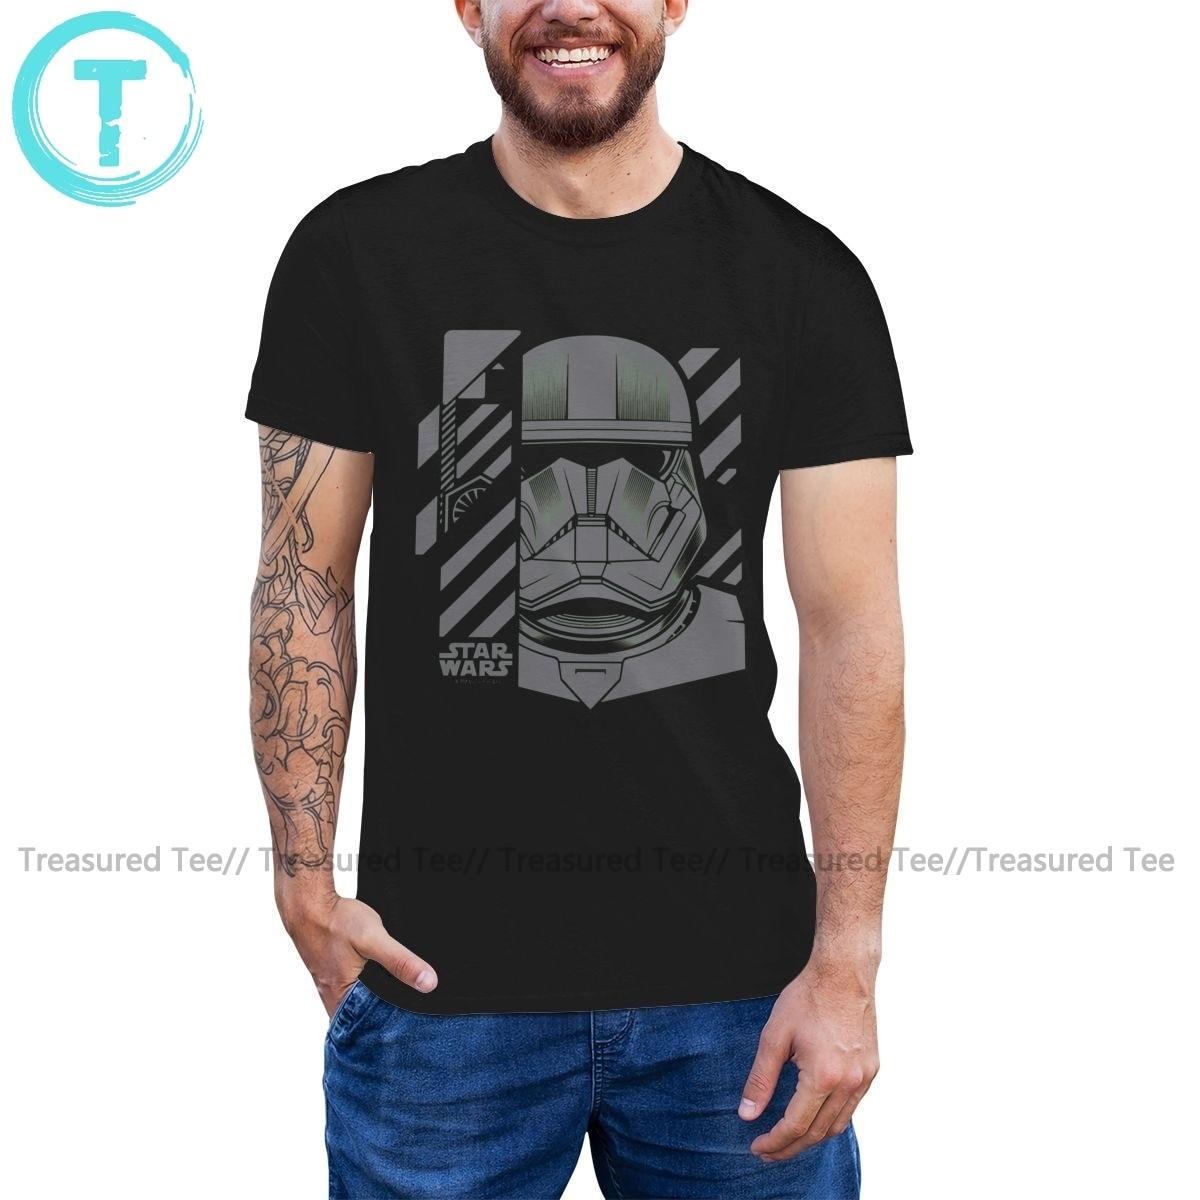 Sith t camisa estilo industrial sith trooper gráfico t-camisa de algodão moda t camisa do divertimento dos homens tshirt